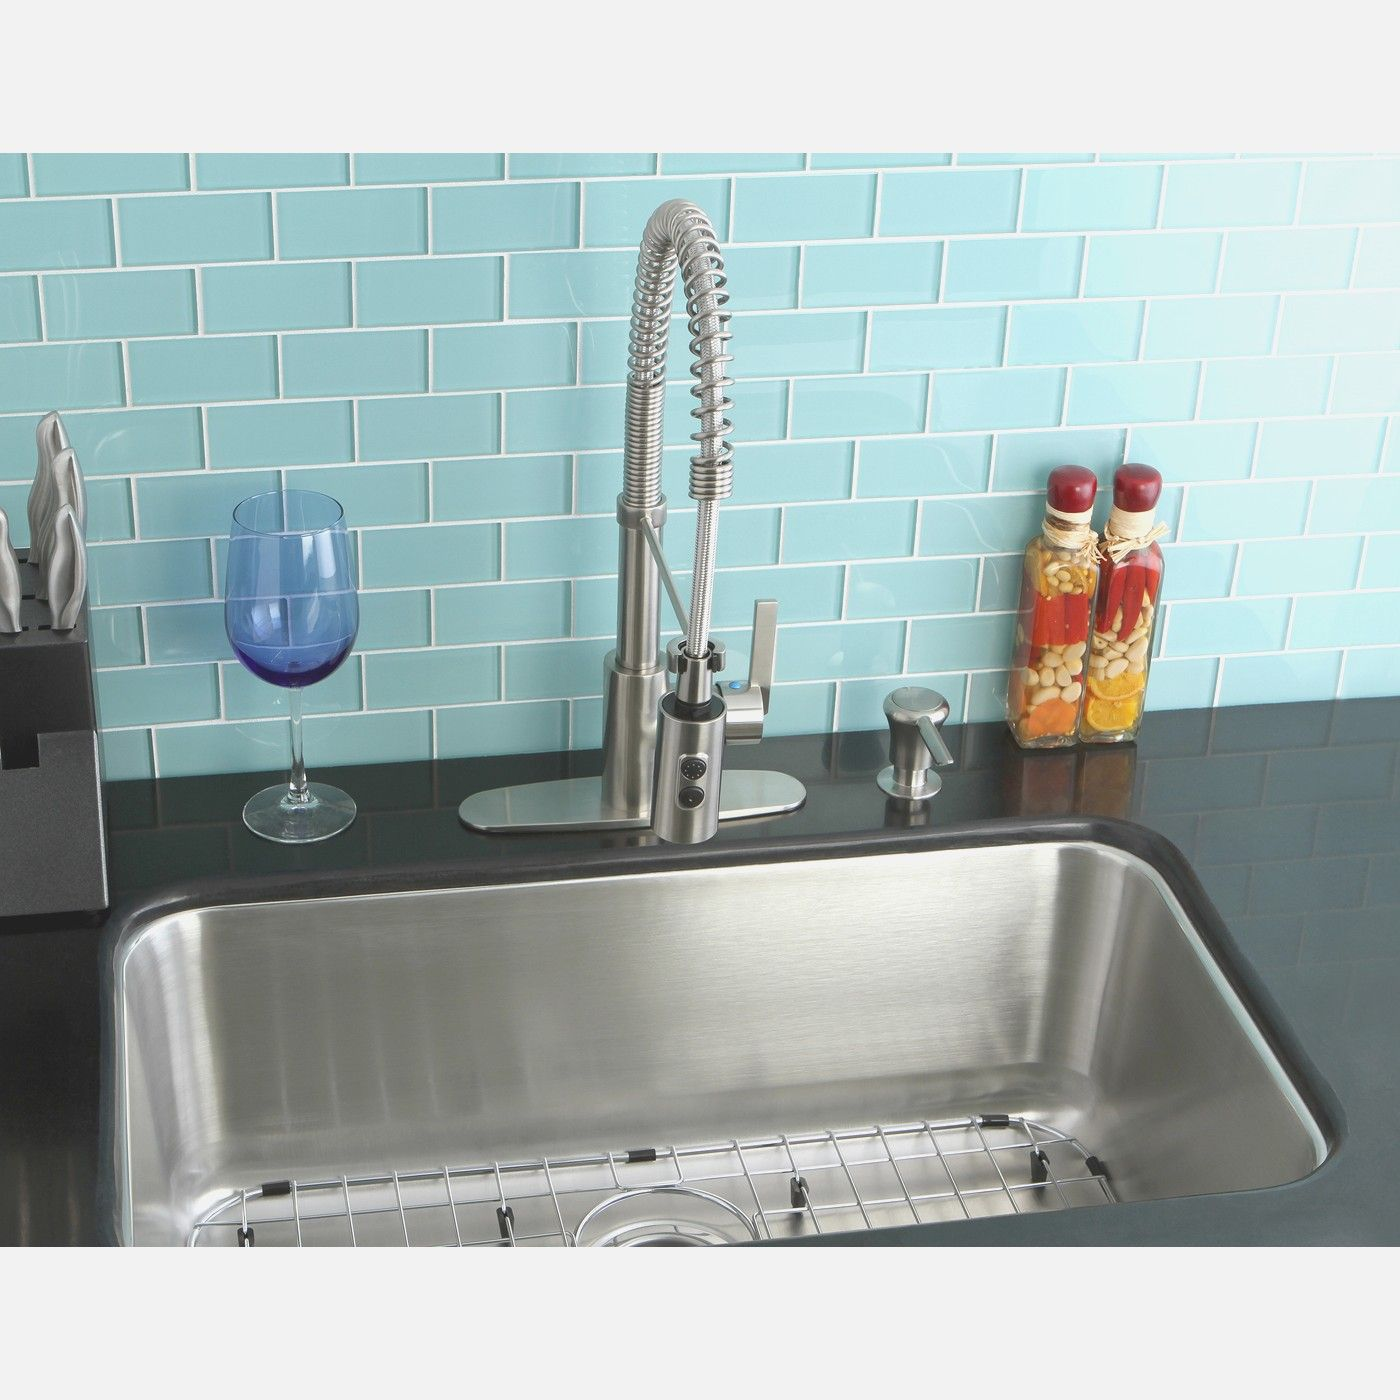 Undermount Single Bowl Kitchen Sink - 30 inch undermount single bowl ...